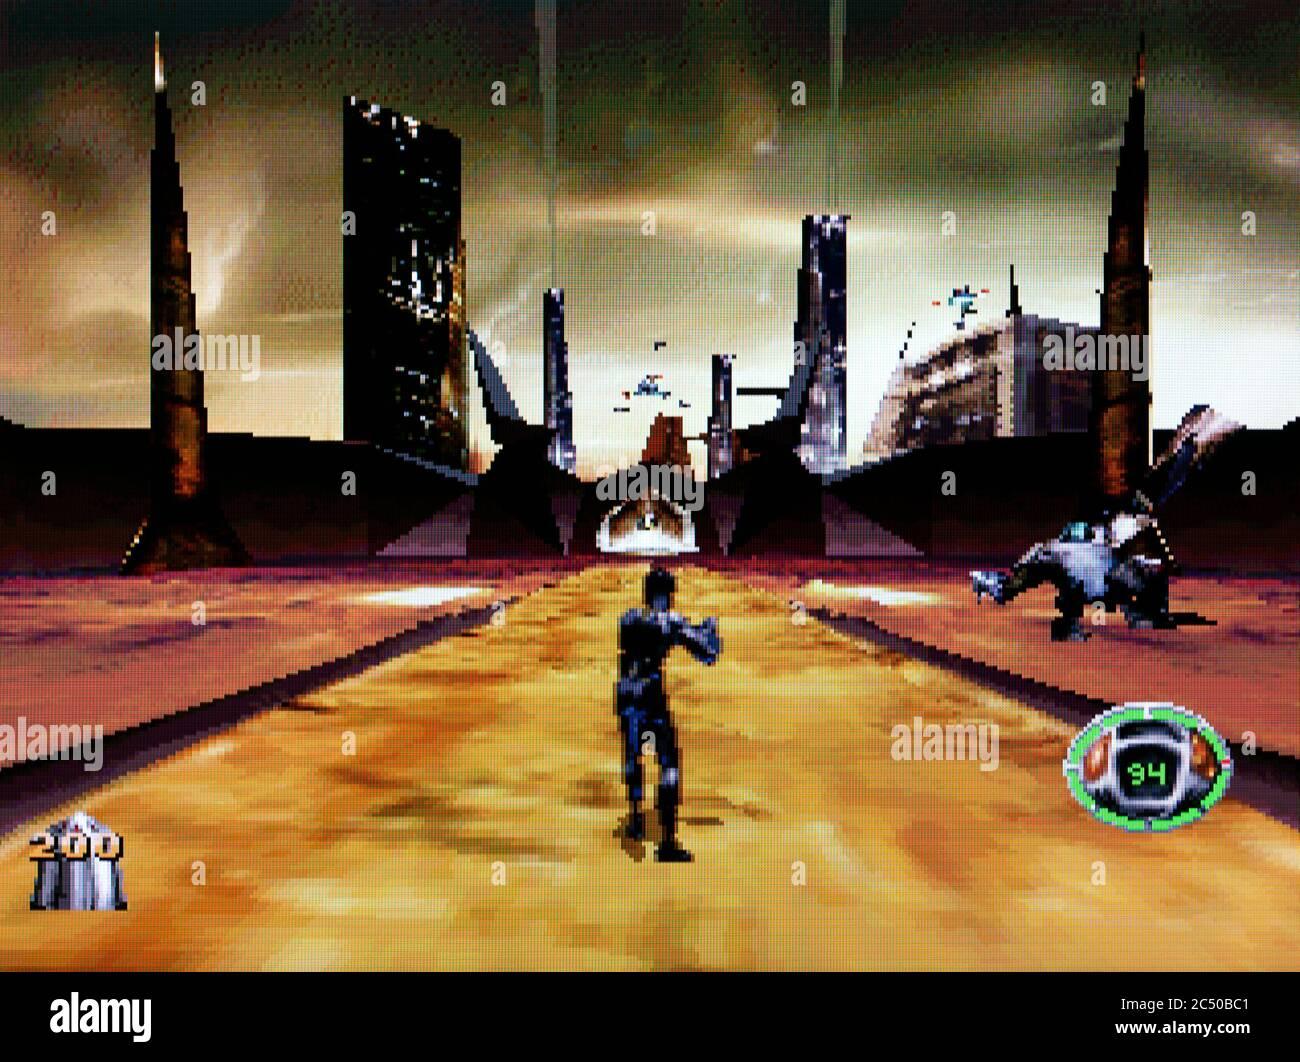 MDK - Sony PlayStation 1 PS1 PSX - solo para uso editorial Foto de stock